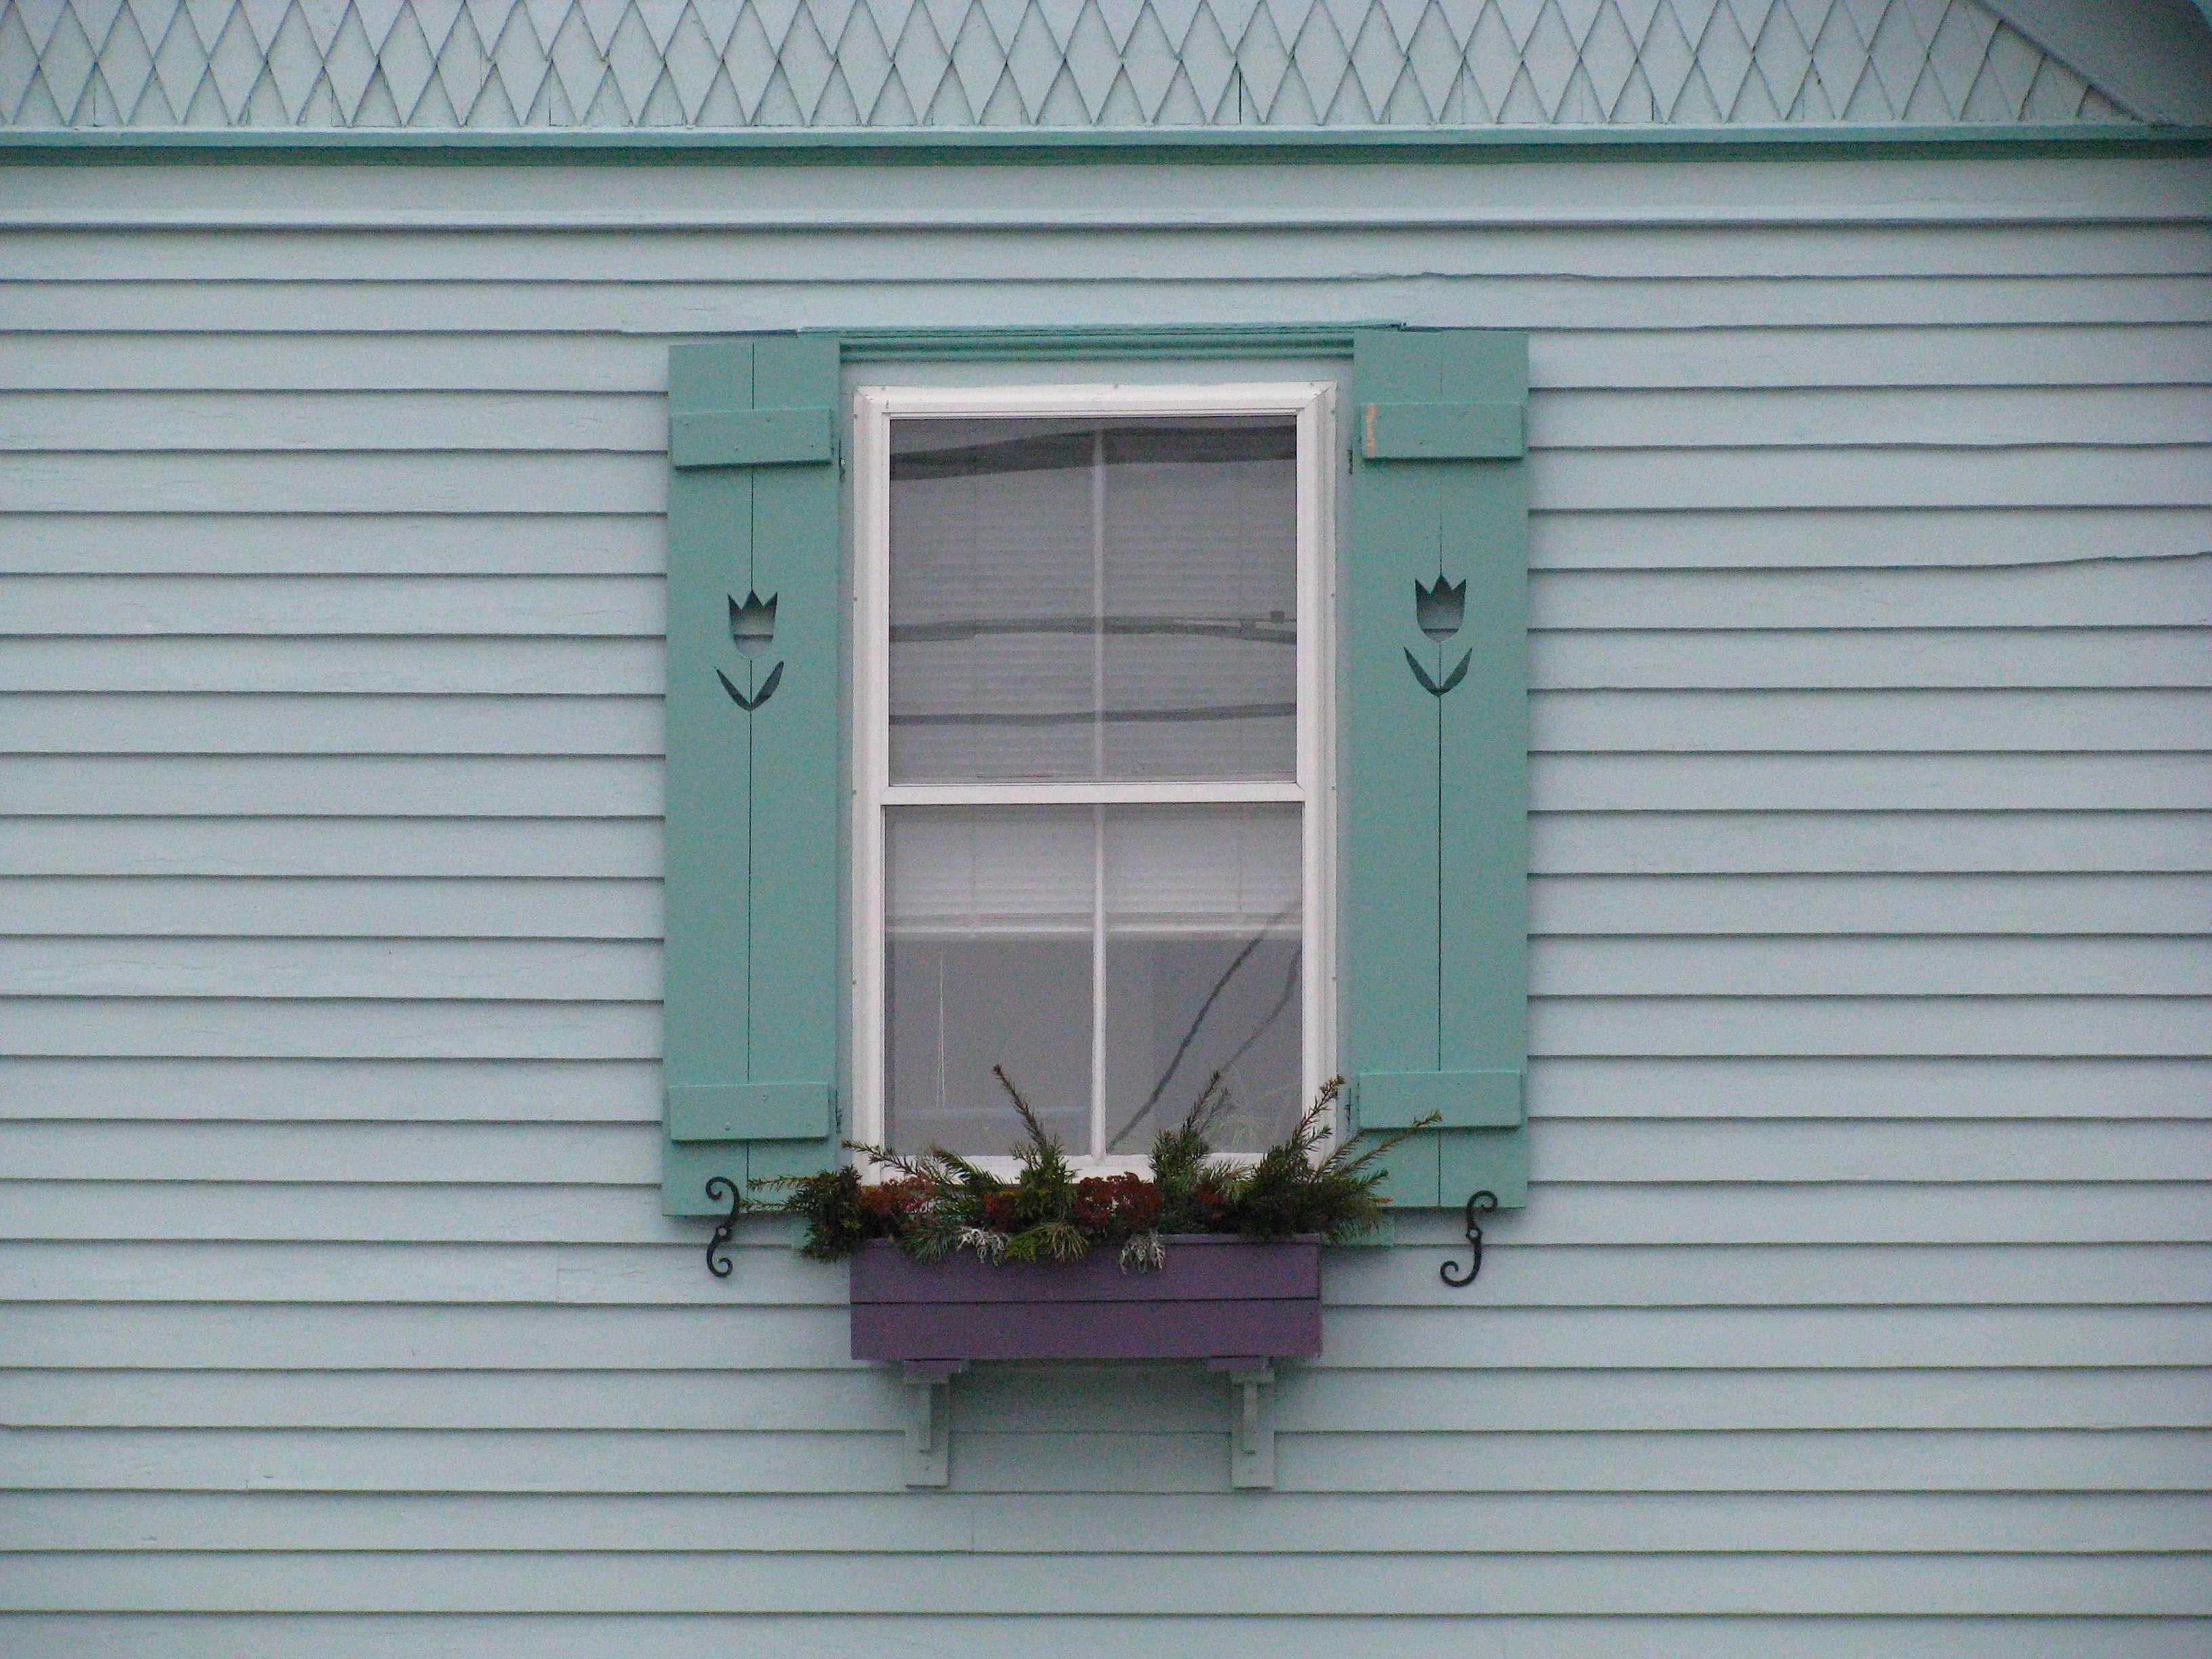 atg louvered home exterior hardware us louver design decor shutter decorative by shutters mrsilva cedar stores